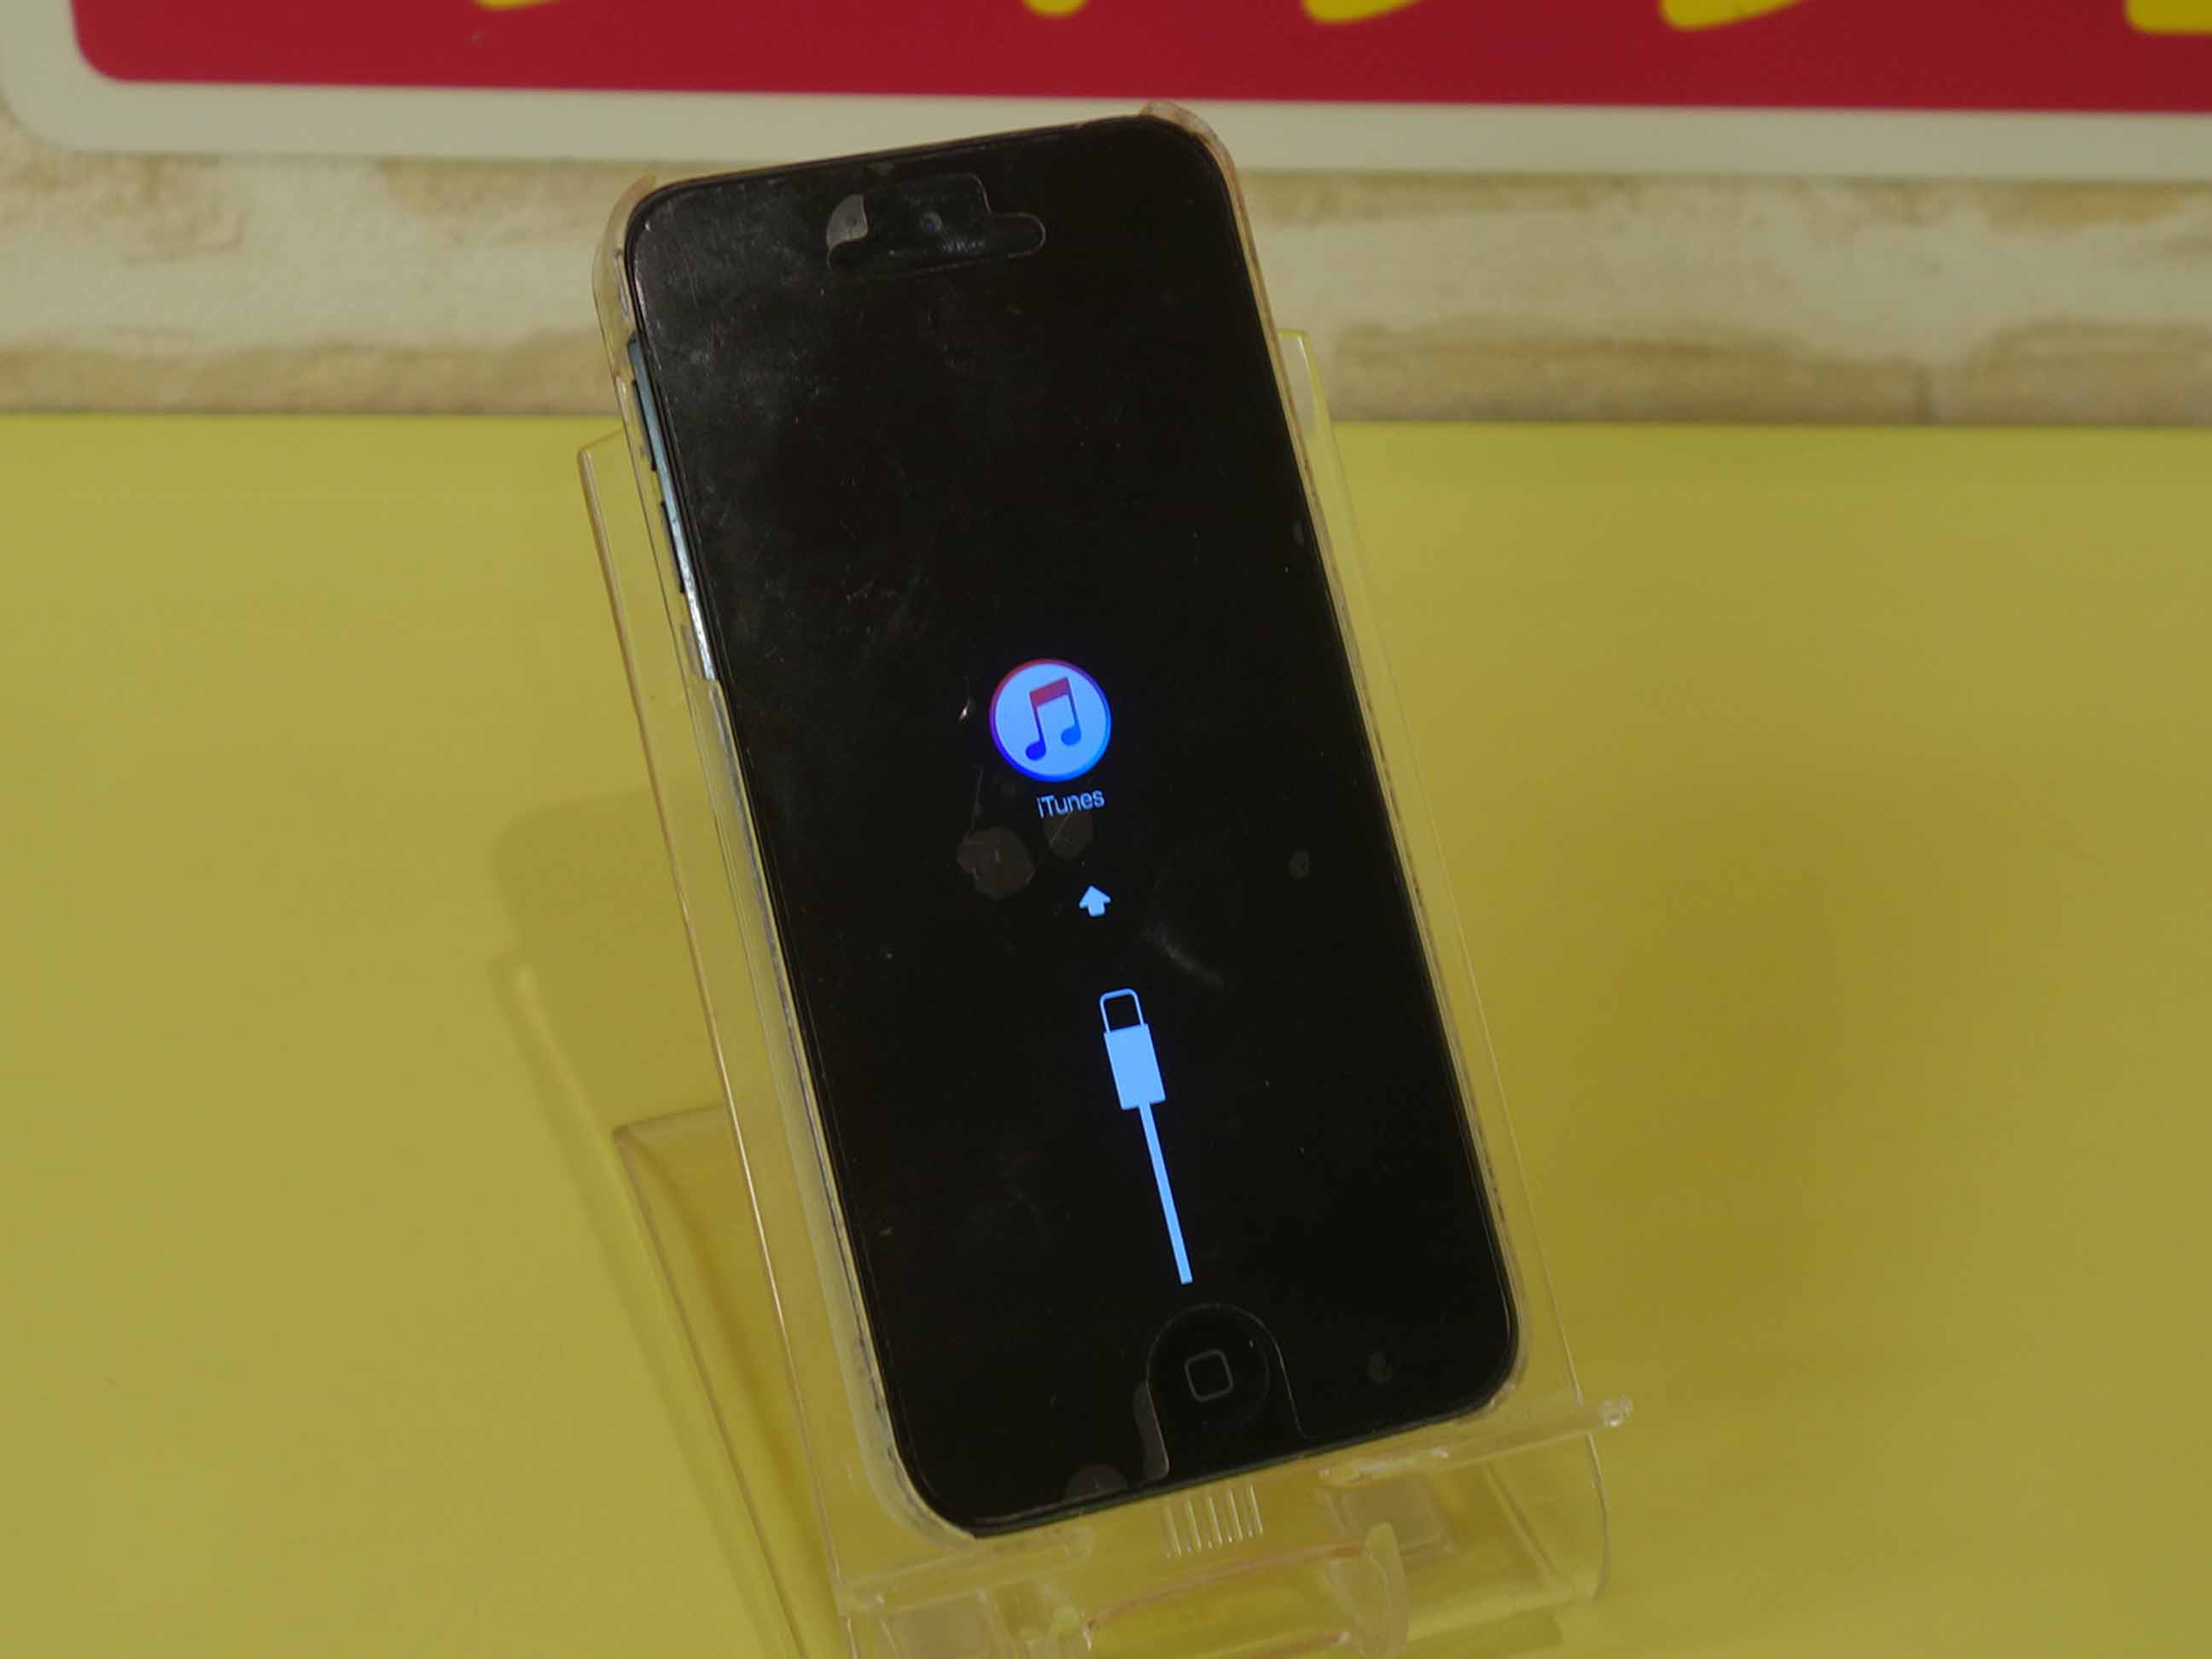 iPodtouch6のリカバリーモード修理に名古屋市内よりご来店!アイポッド修理もクイック名古屋